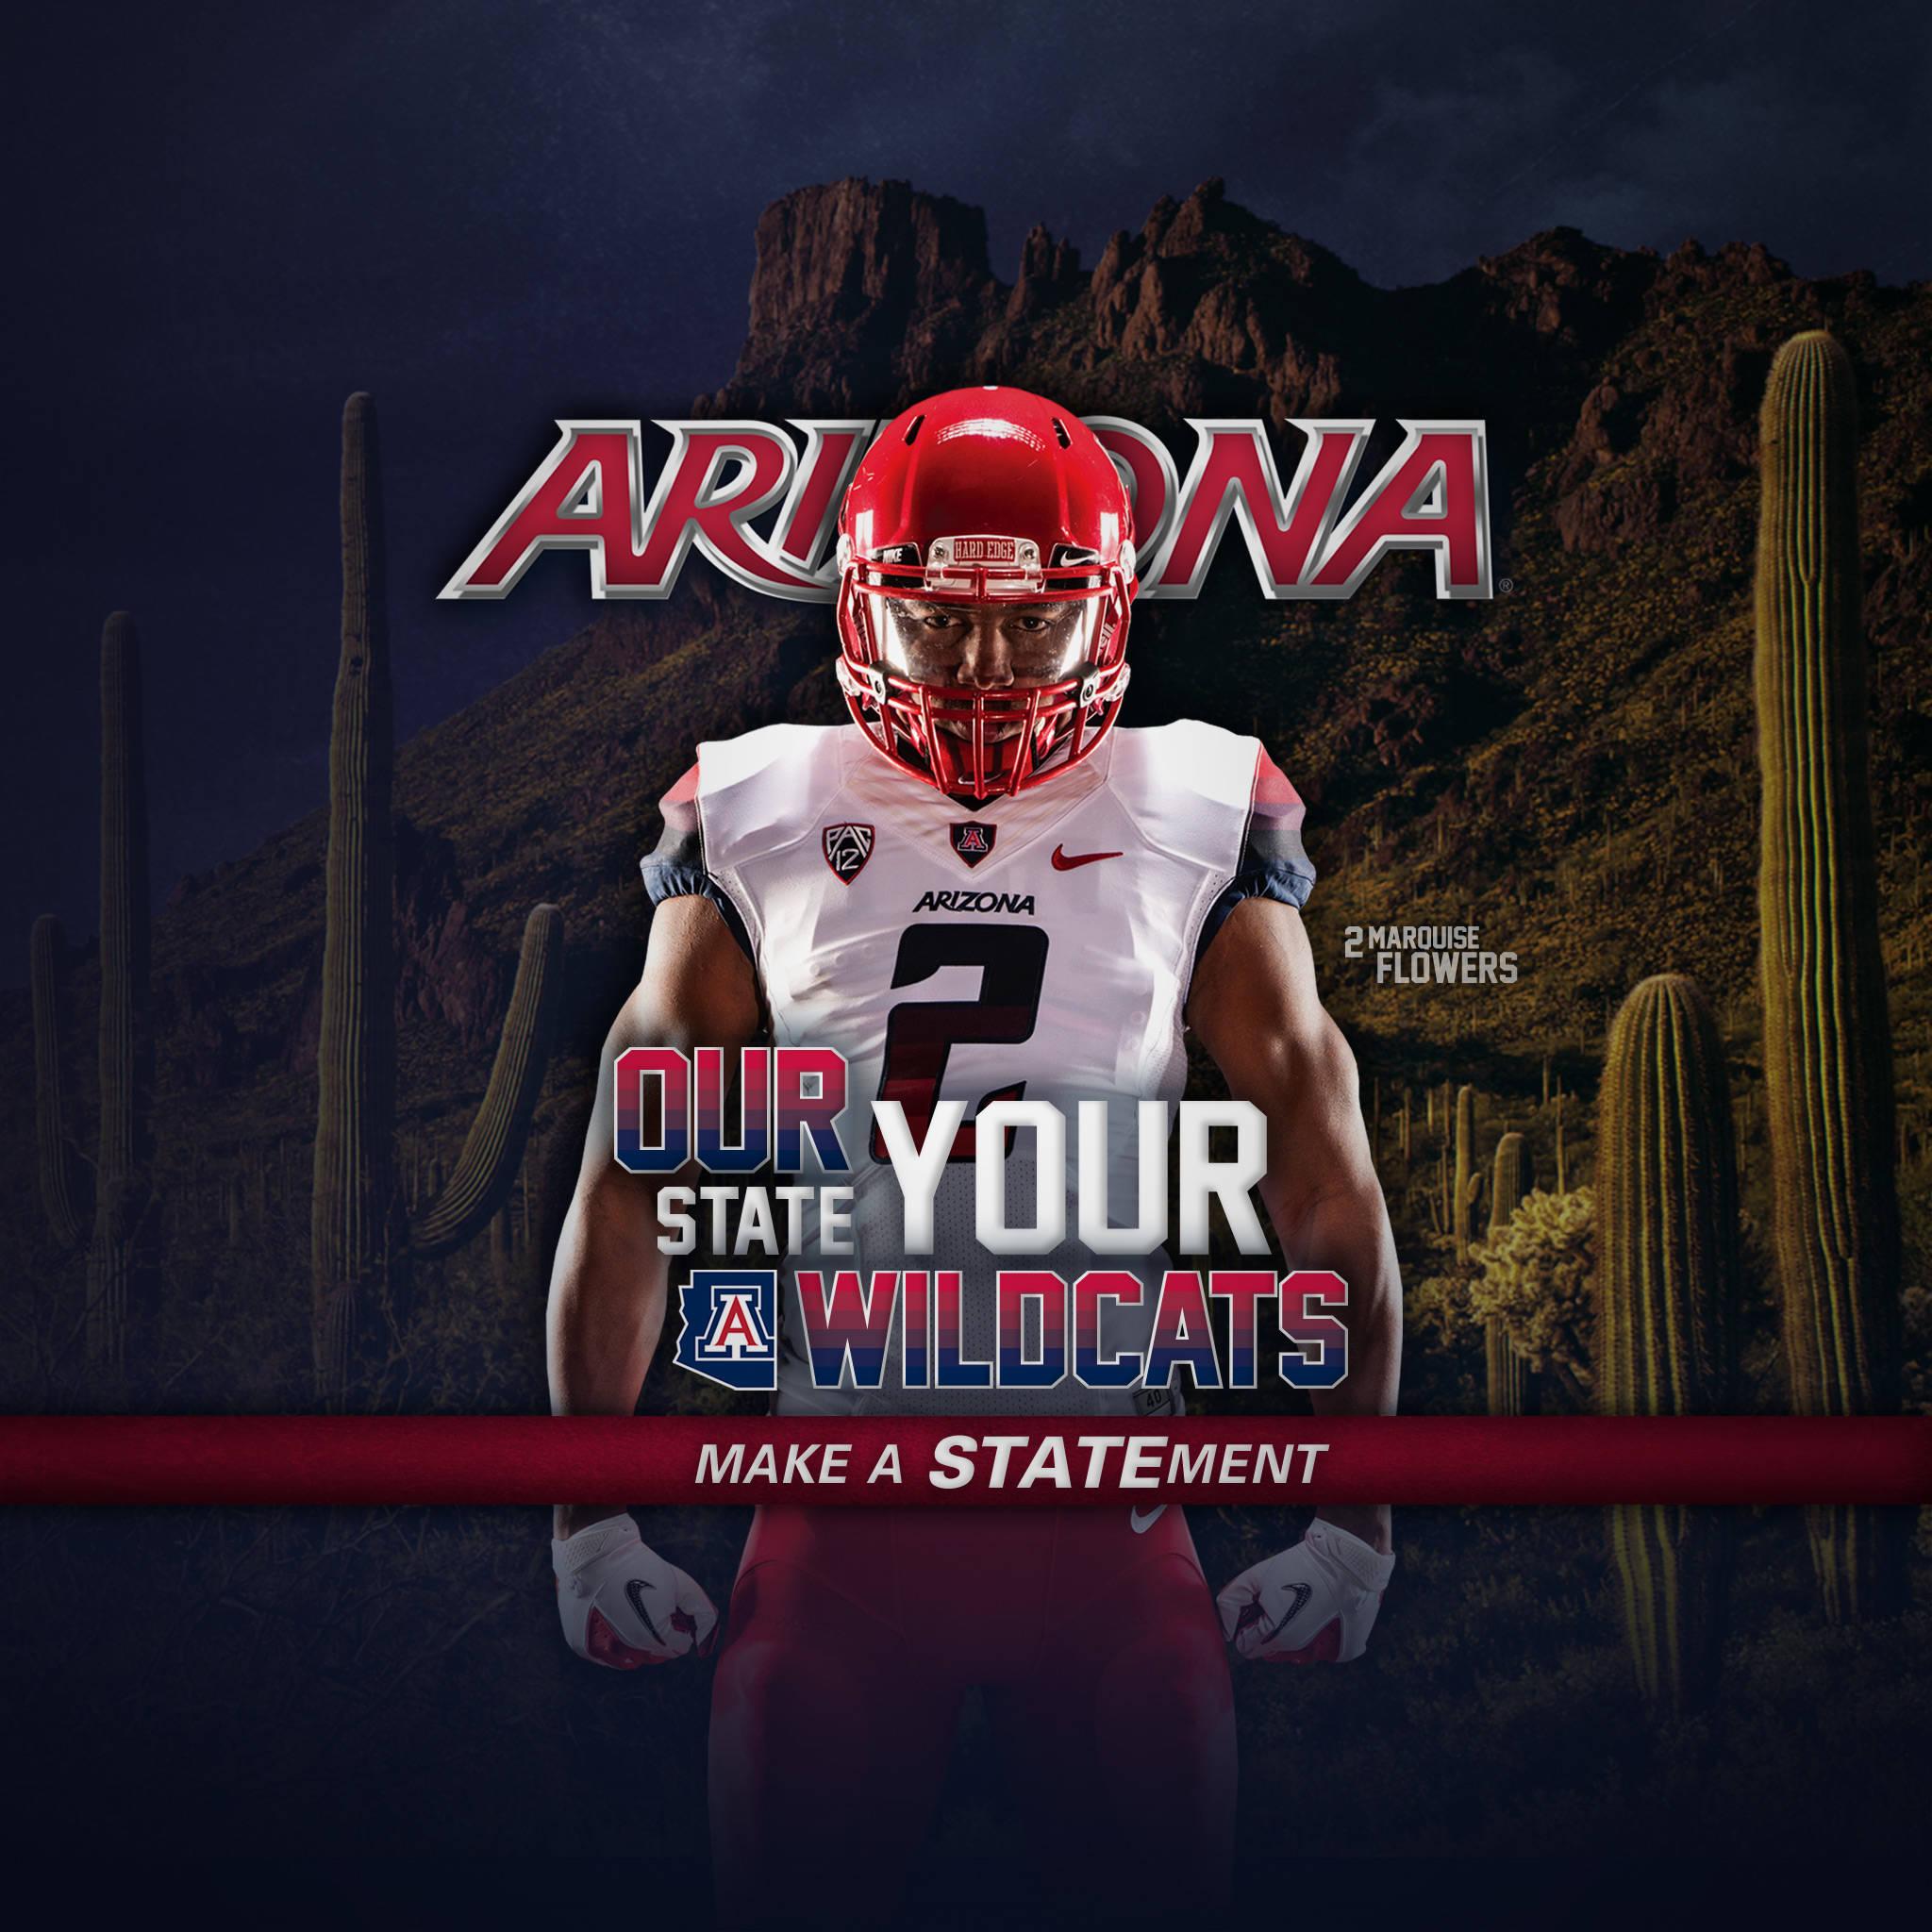 University Of Arizona Wildcats Wallpaper 2013 arizona football 2048x2048